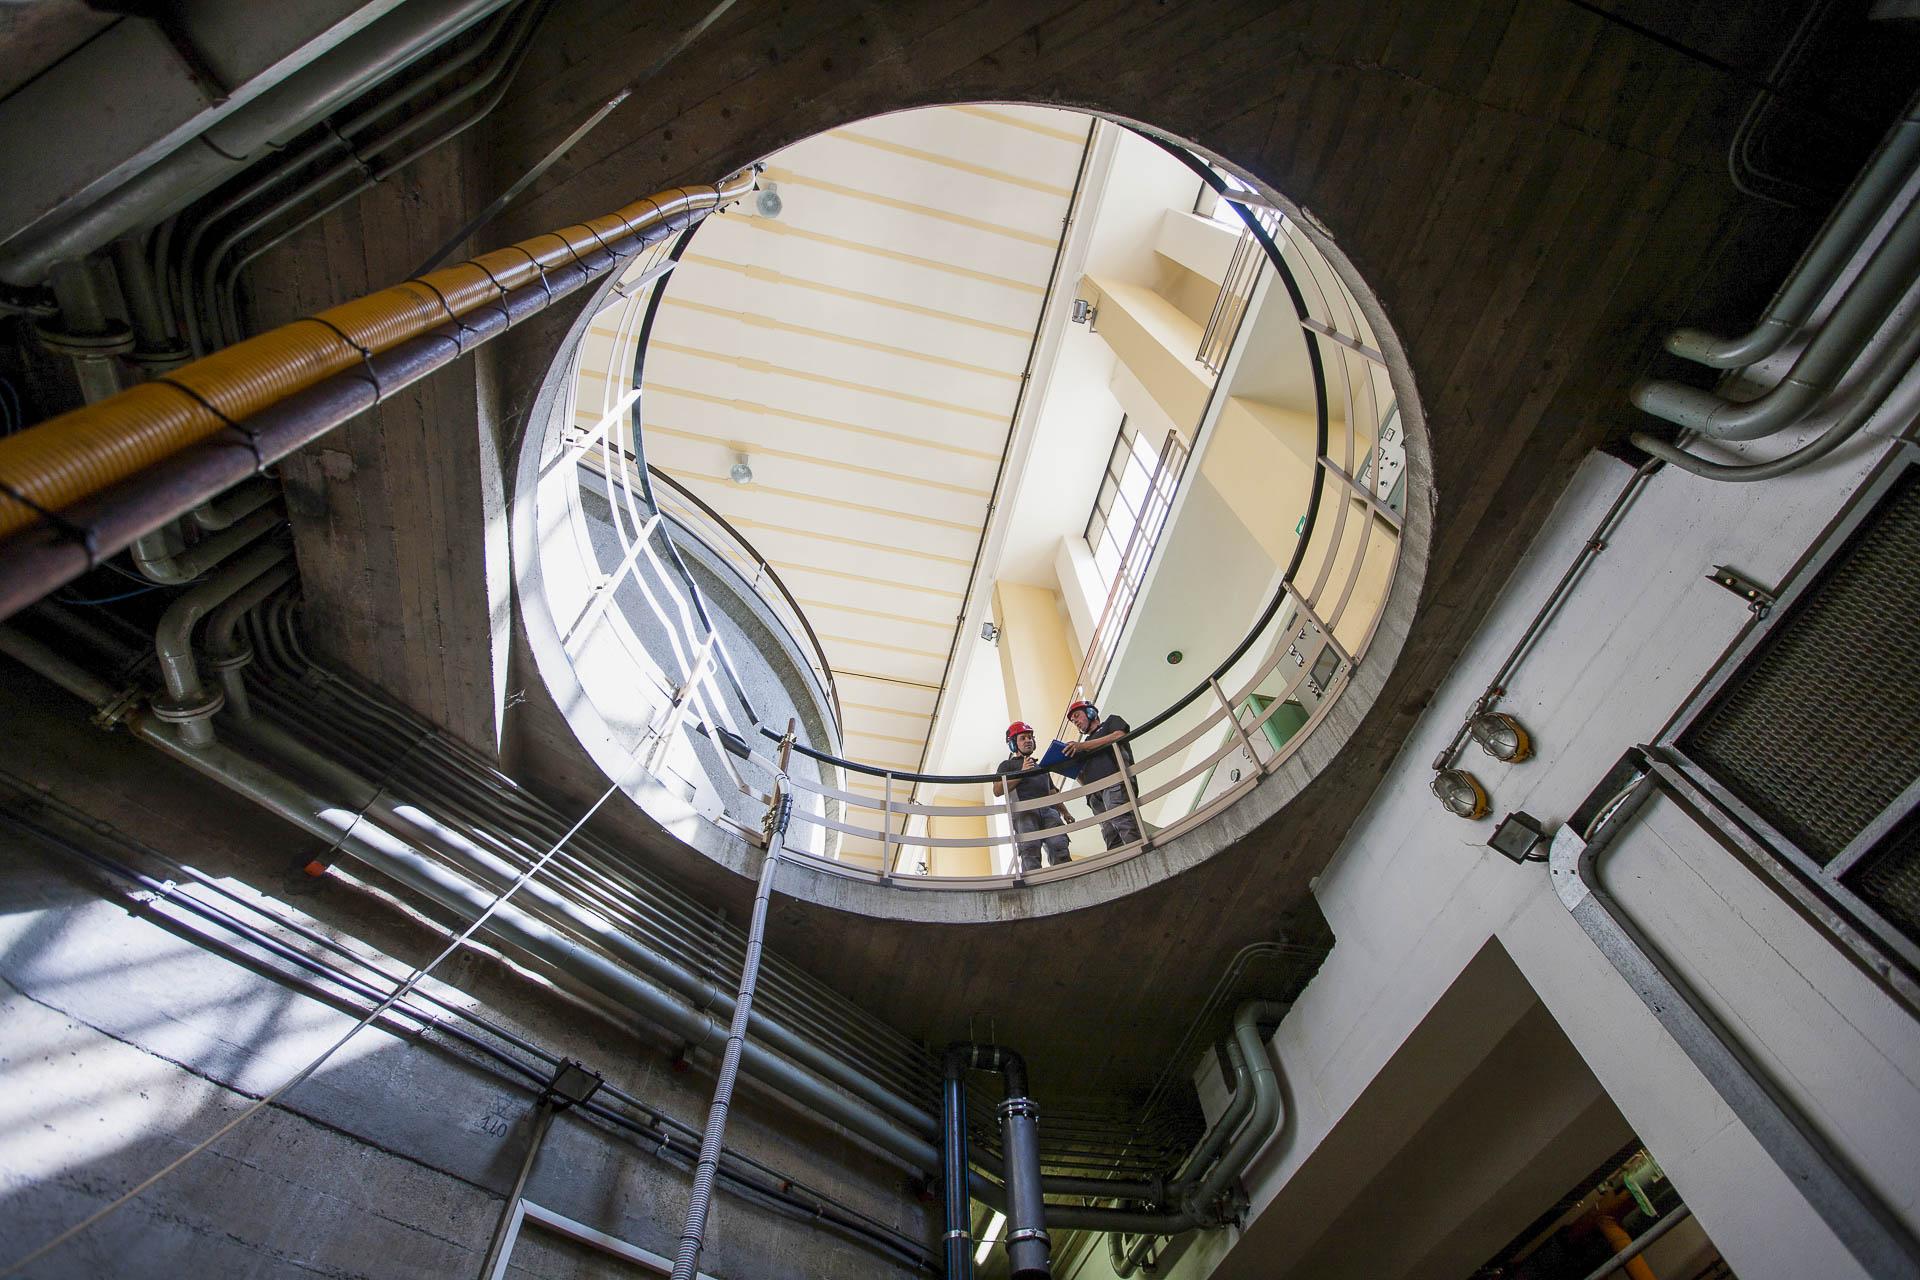 Centrale idroelettrica di Montjovet per produzione energia verde rinnovabile CVA